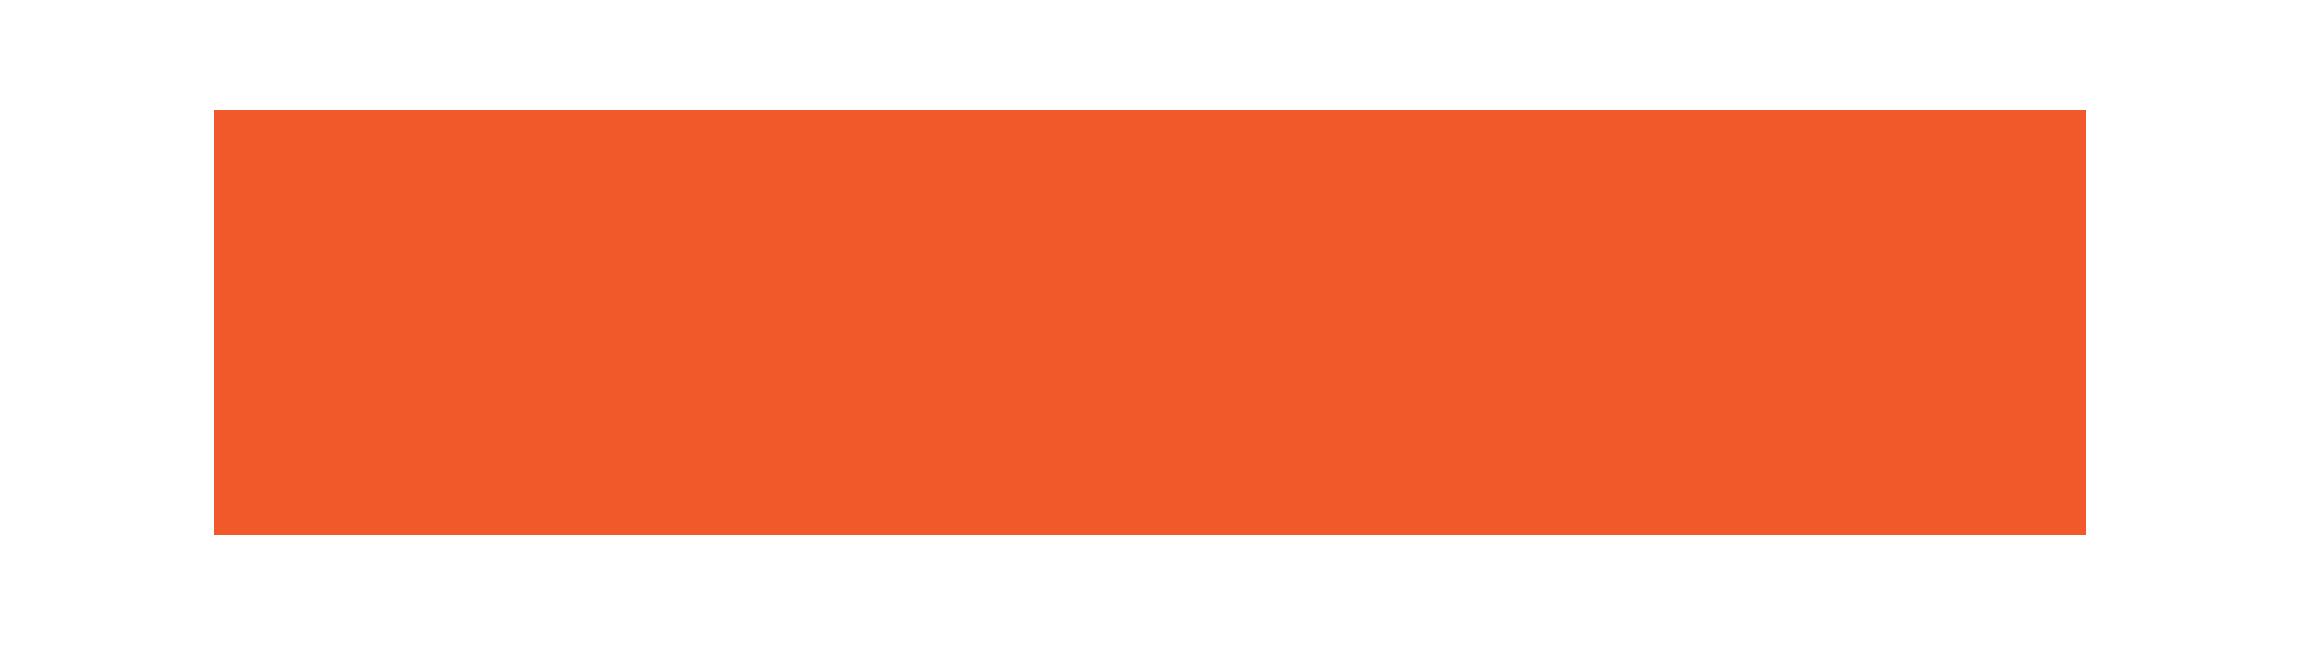 pandect bioventures